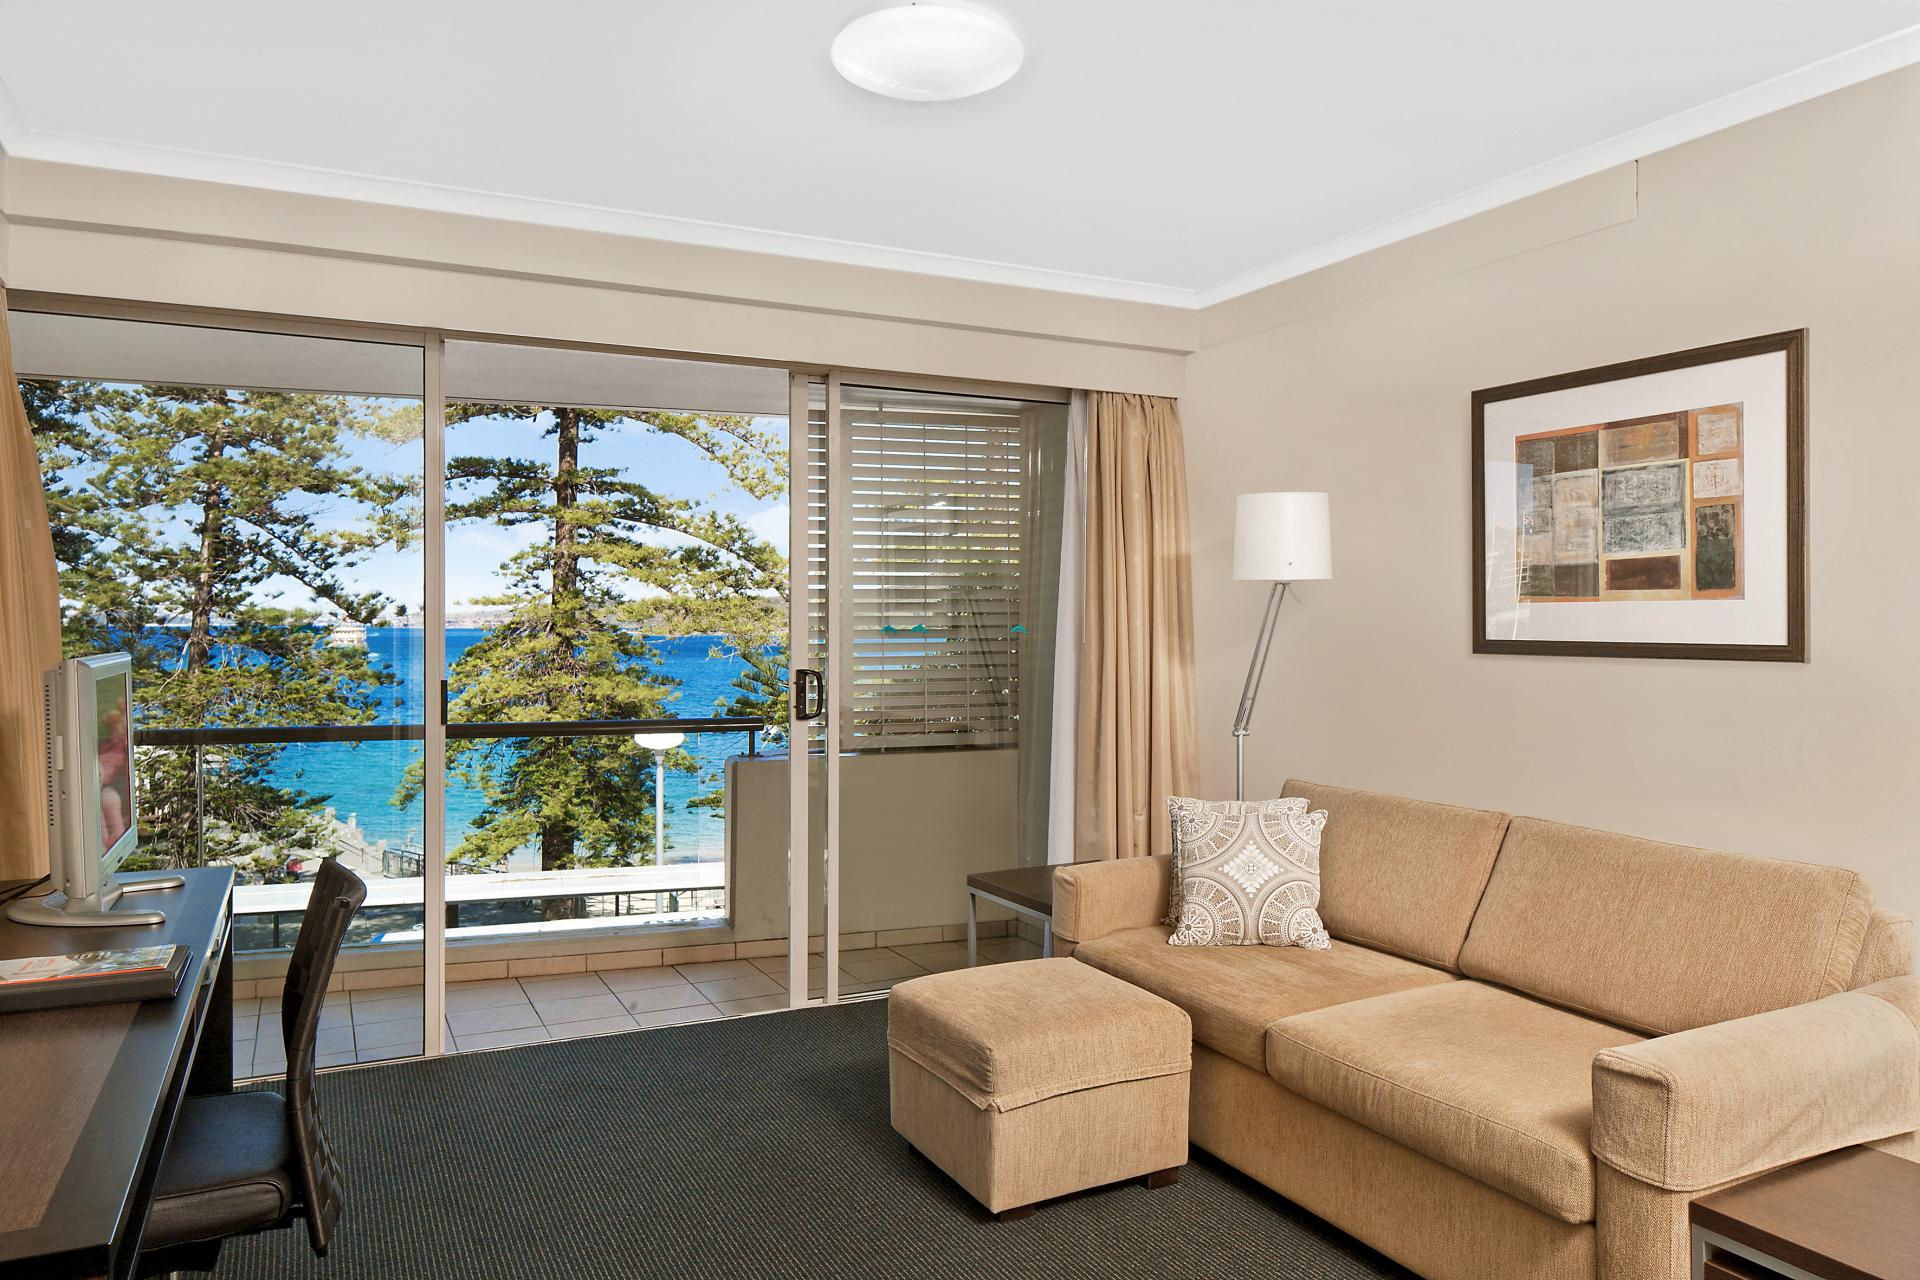 Sofa https://one.orbitalplatforms.com/app/properties/apartment-facilities/3779